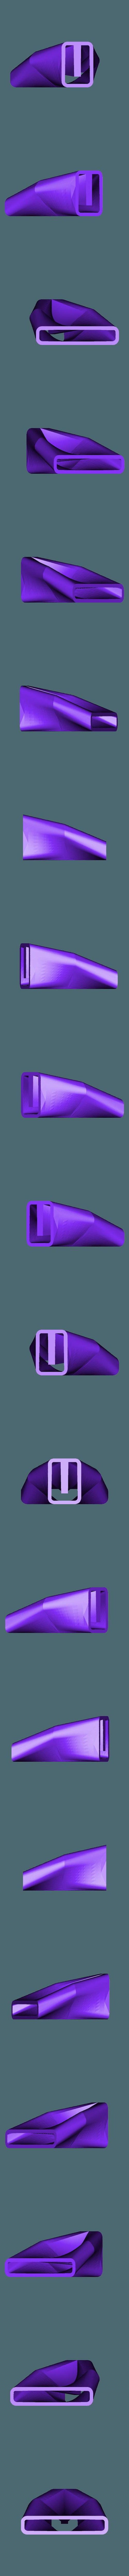 4cm_Tape_U_fold.stl Download free STL file 3cm / 3.5cm / 4cm / 5cm Simple Bias Tape Maker, zakladac pasku • 3D printable template, ongaroo